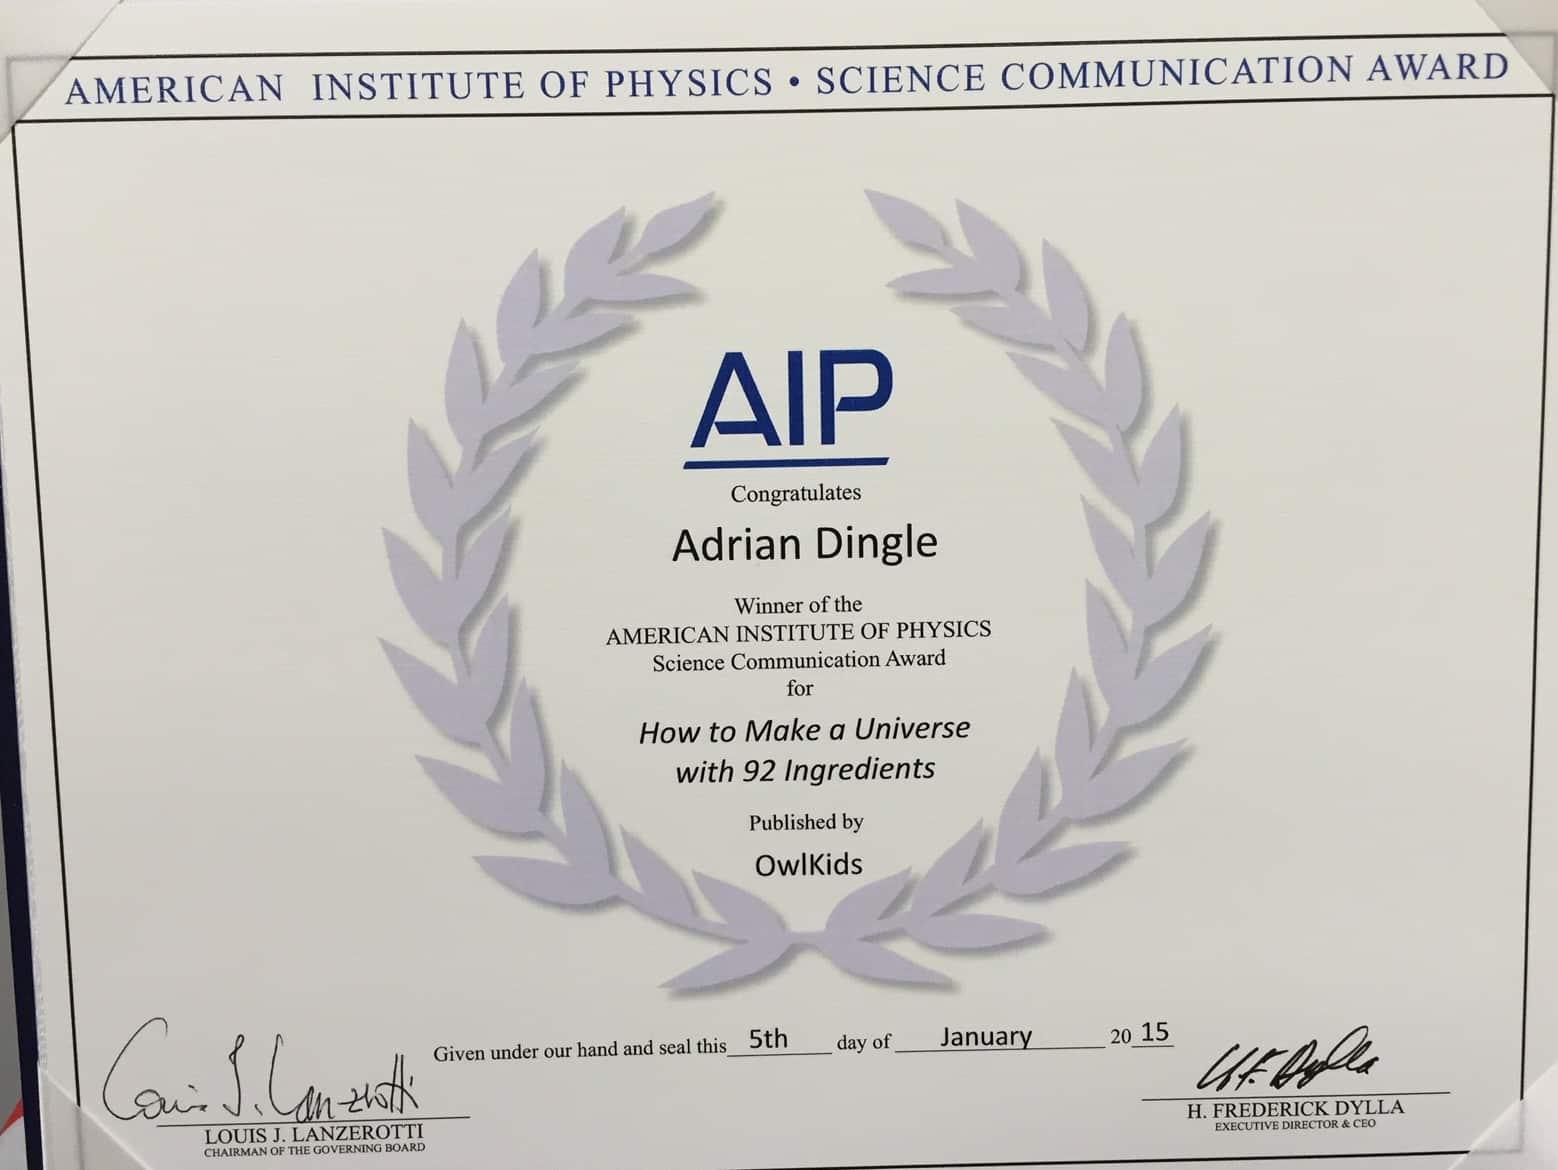 AIP Certificate